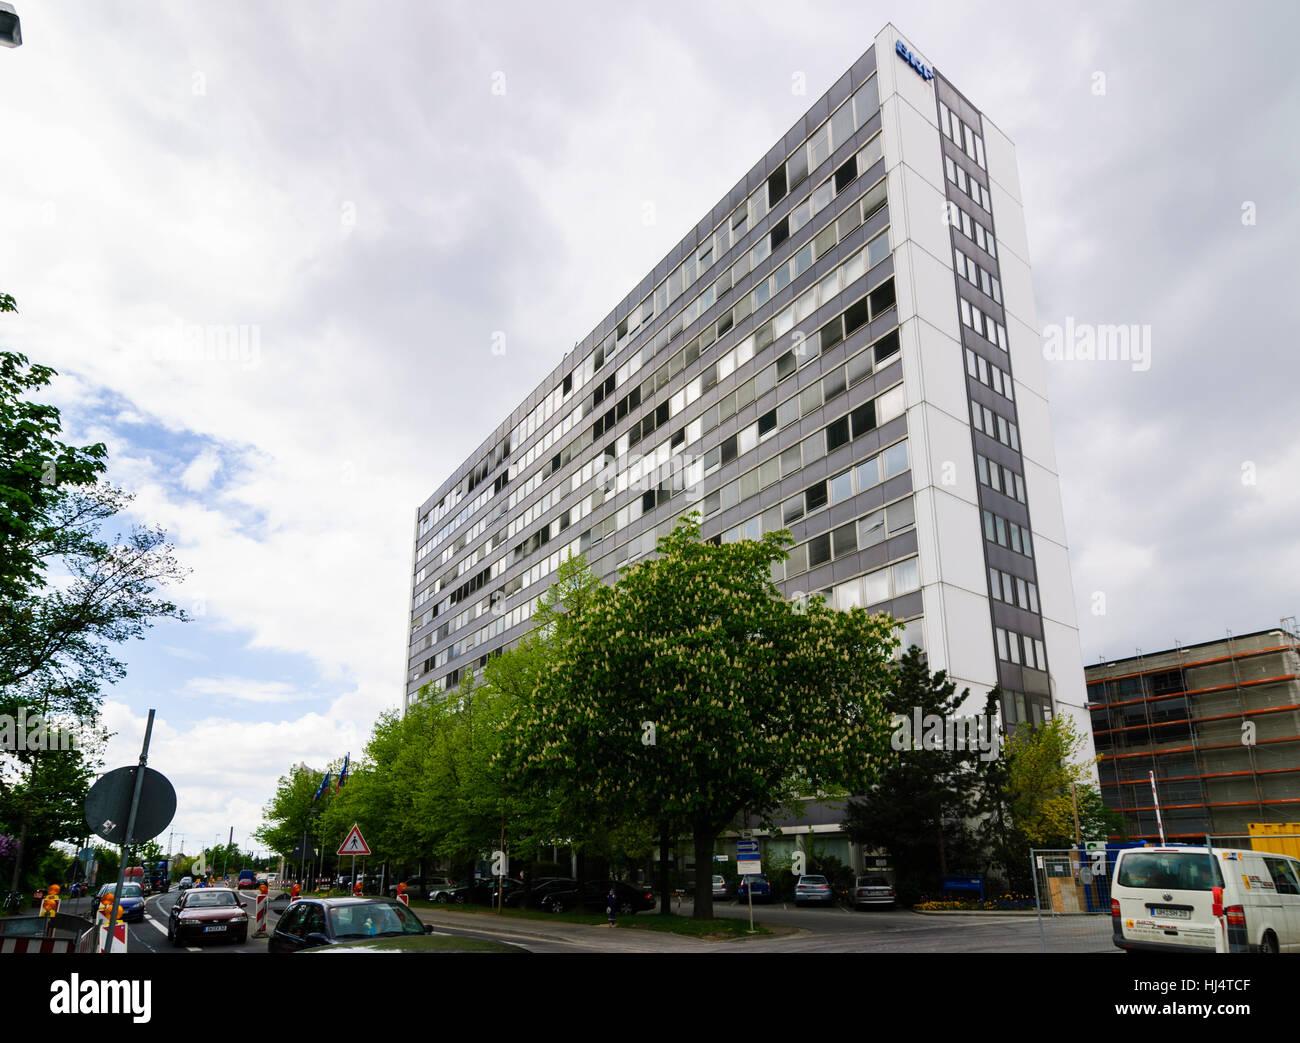 Schweinfurt: Company headquarters of SKF rolling bearing manufacturer (Svenska Kullagerfabriken), Unterfranken, - Stock Image